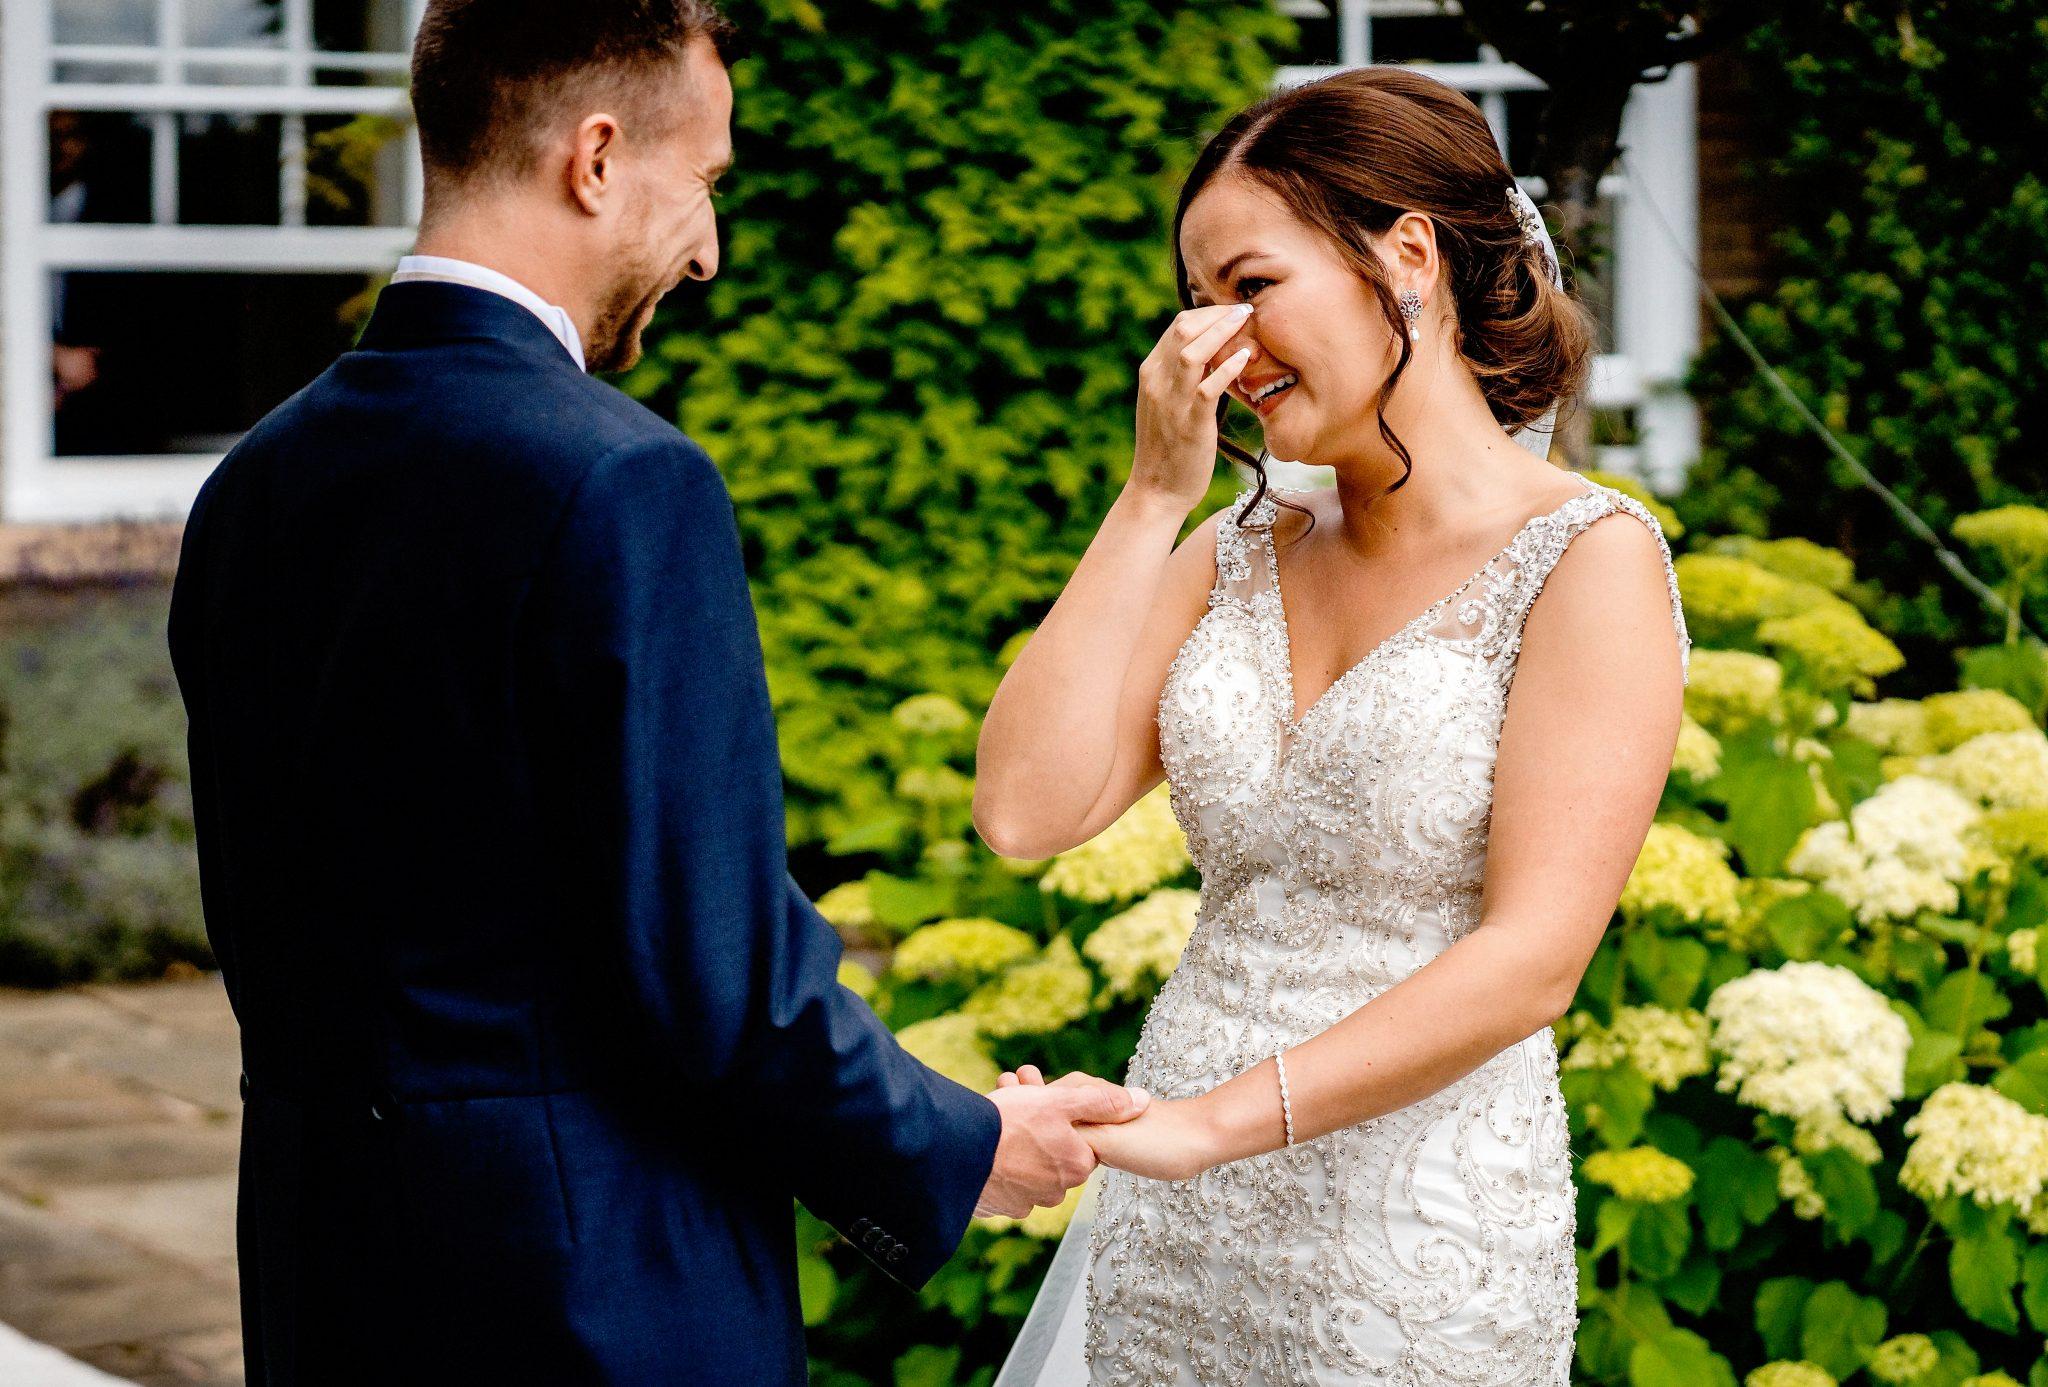 19-Delamere-Manor-Wedding-Photographer-Cheshire-Wedding-Photography-Ollie-Gyte-Photographer